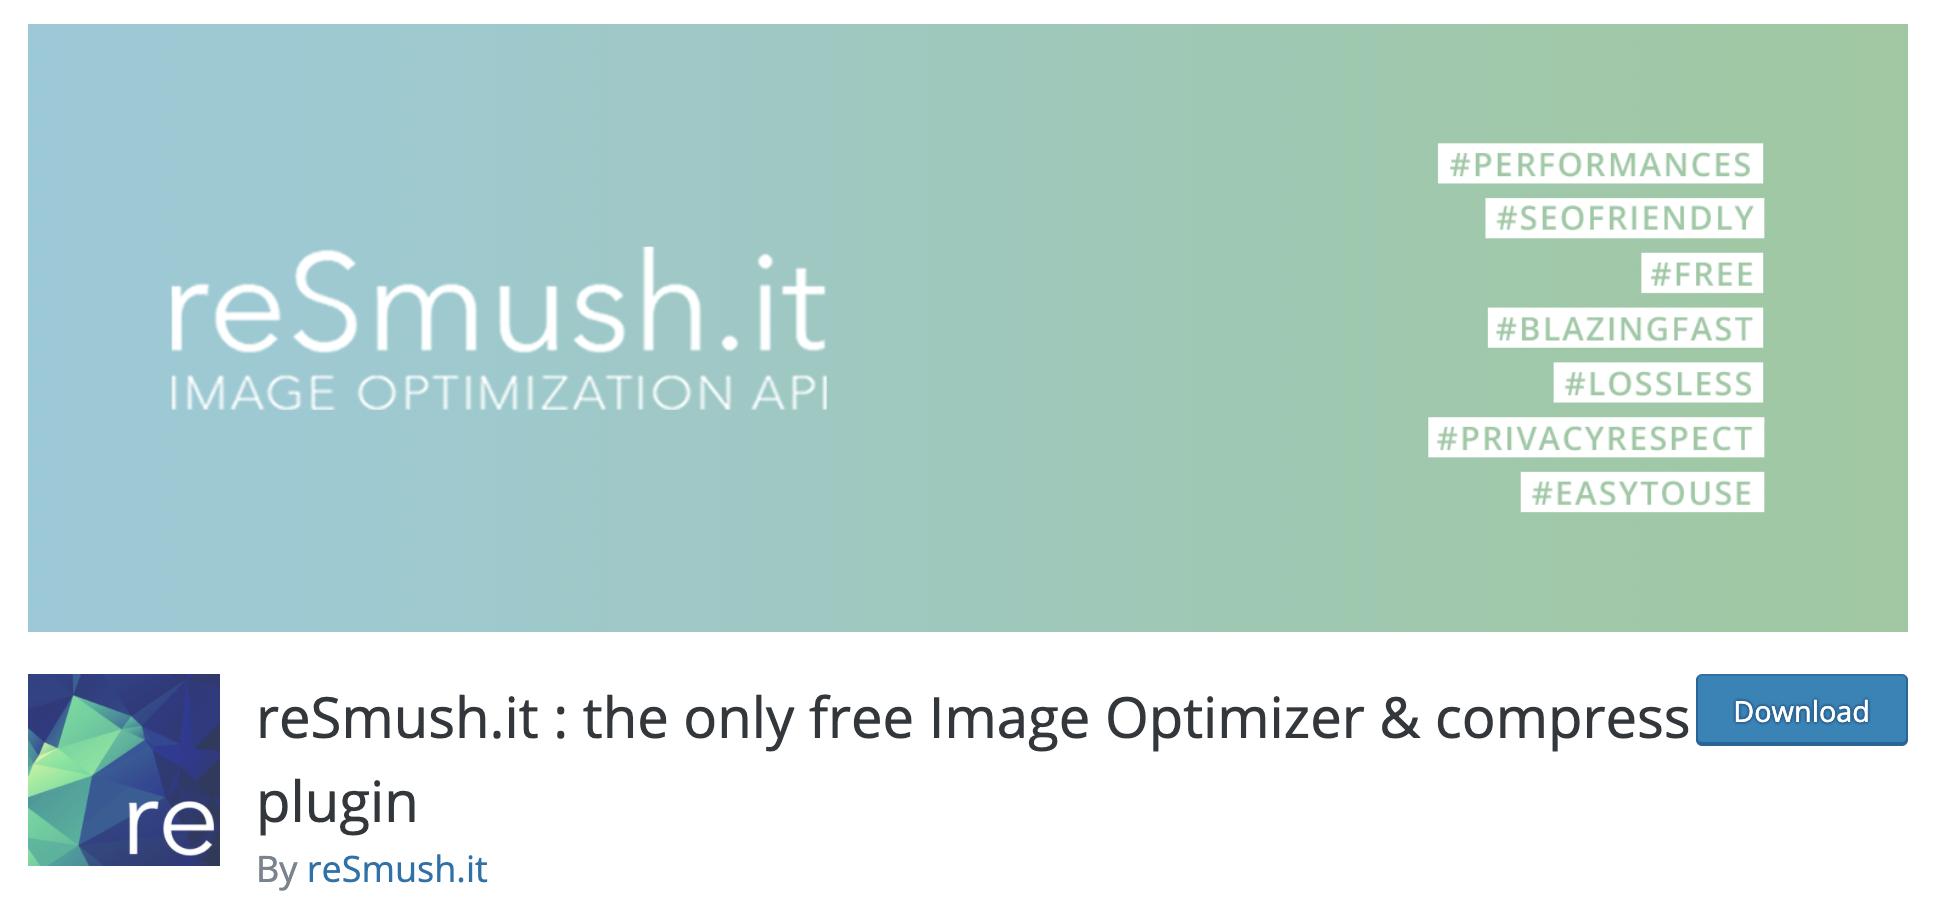 reSmushit - the only free Image Optimizer & compress plugin